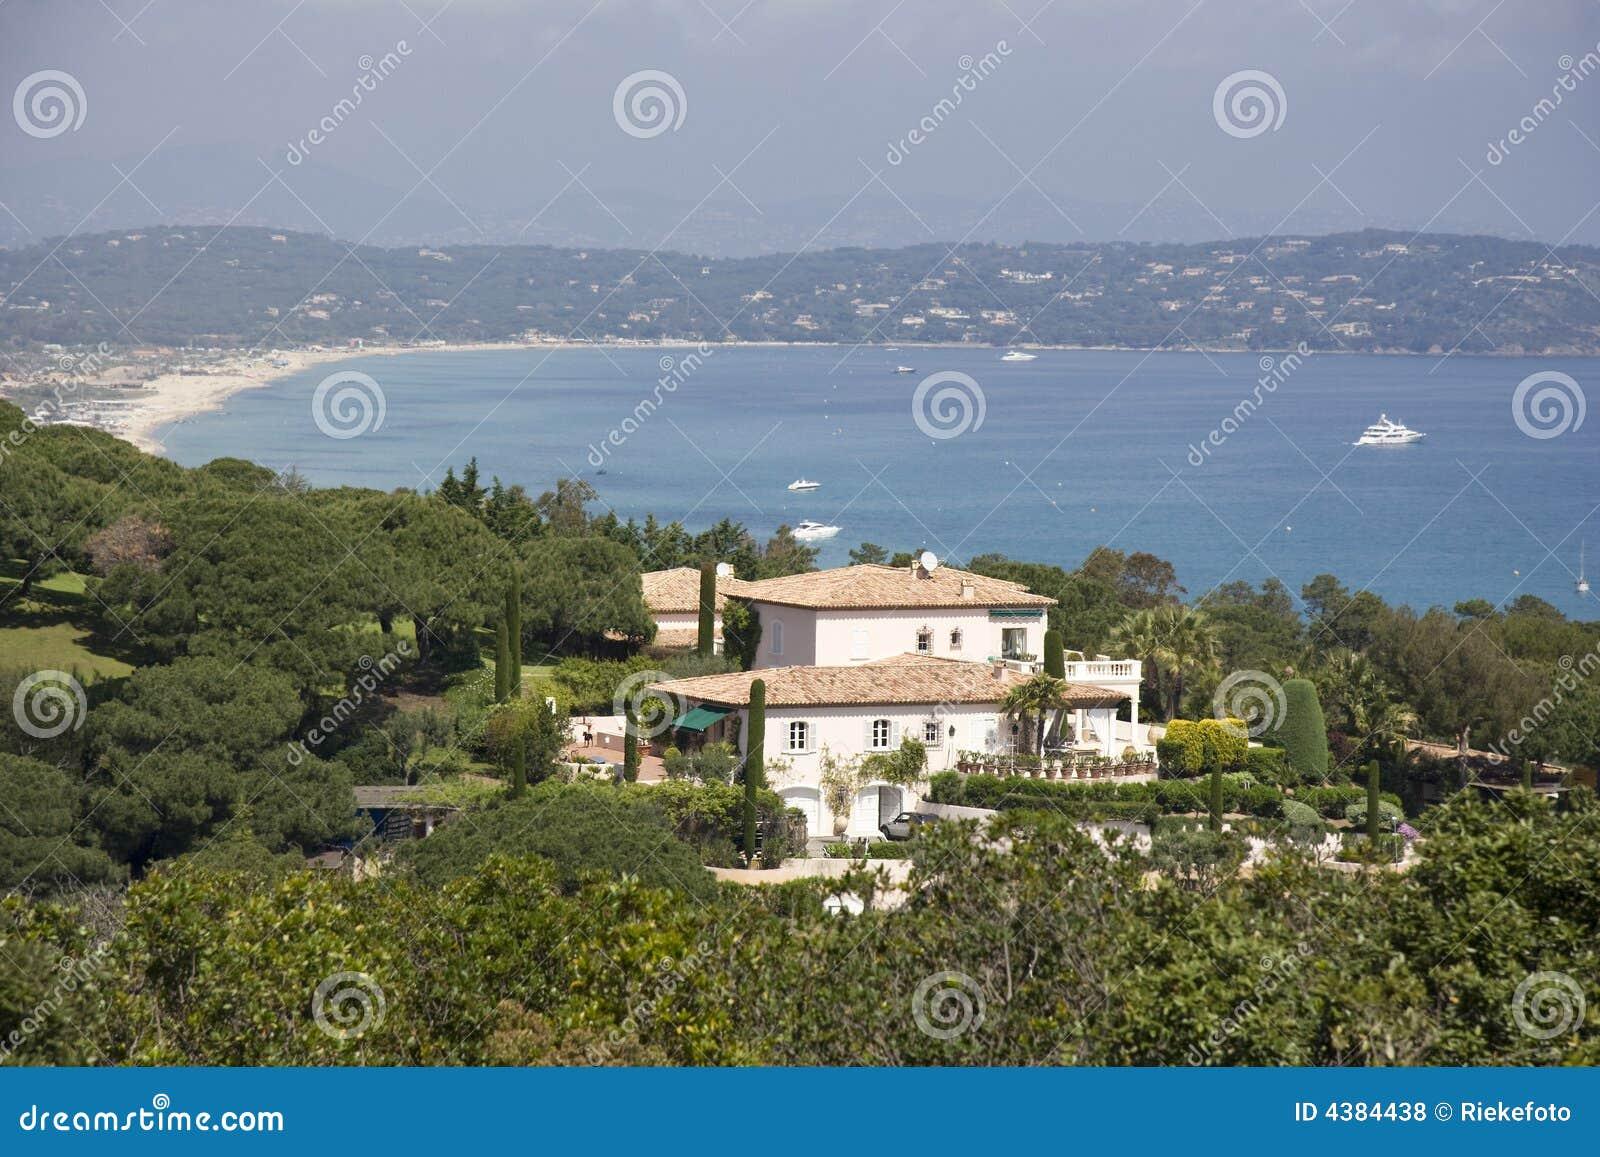 Villa over the gulf of Saint-Tropez